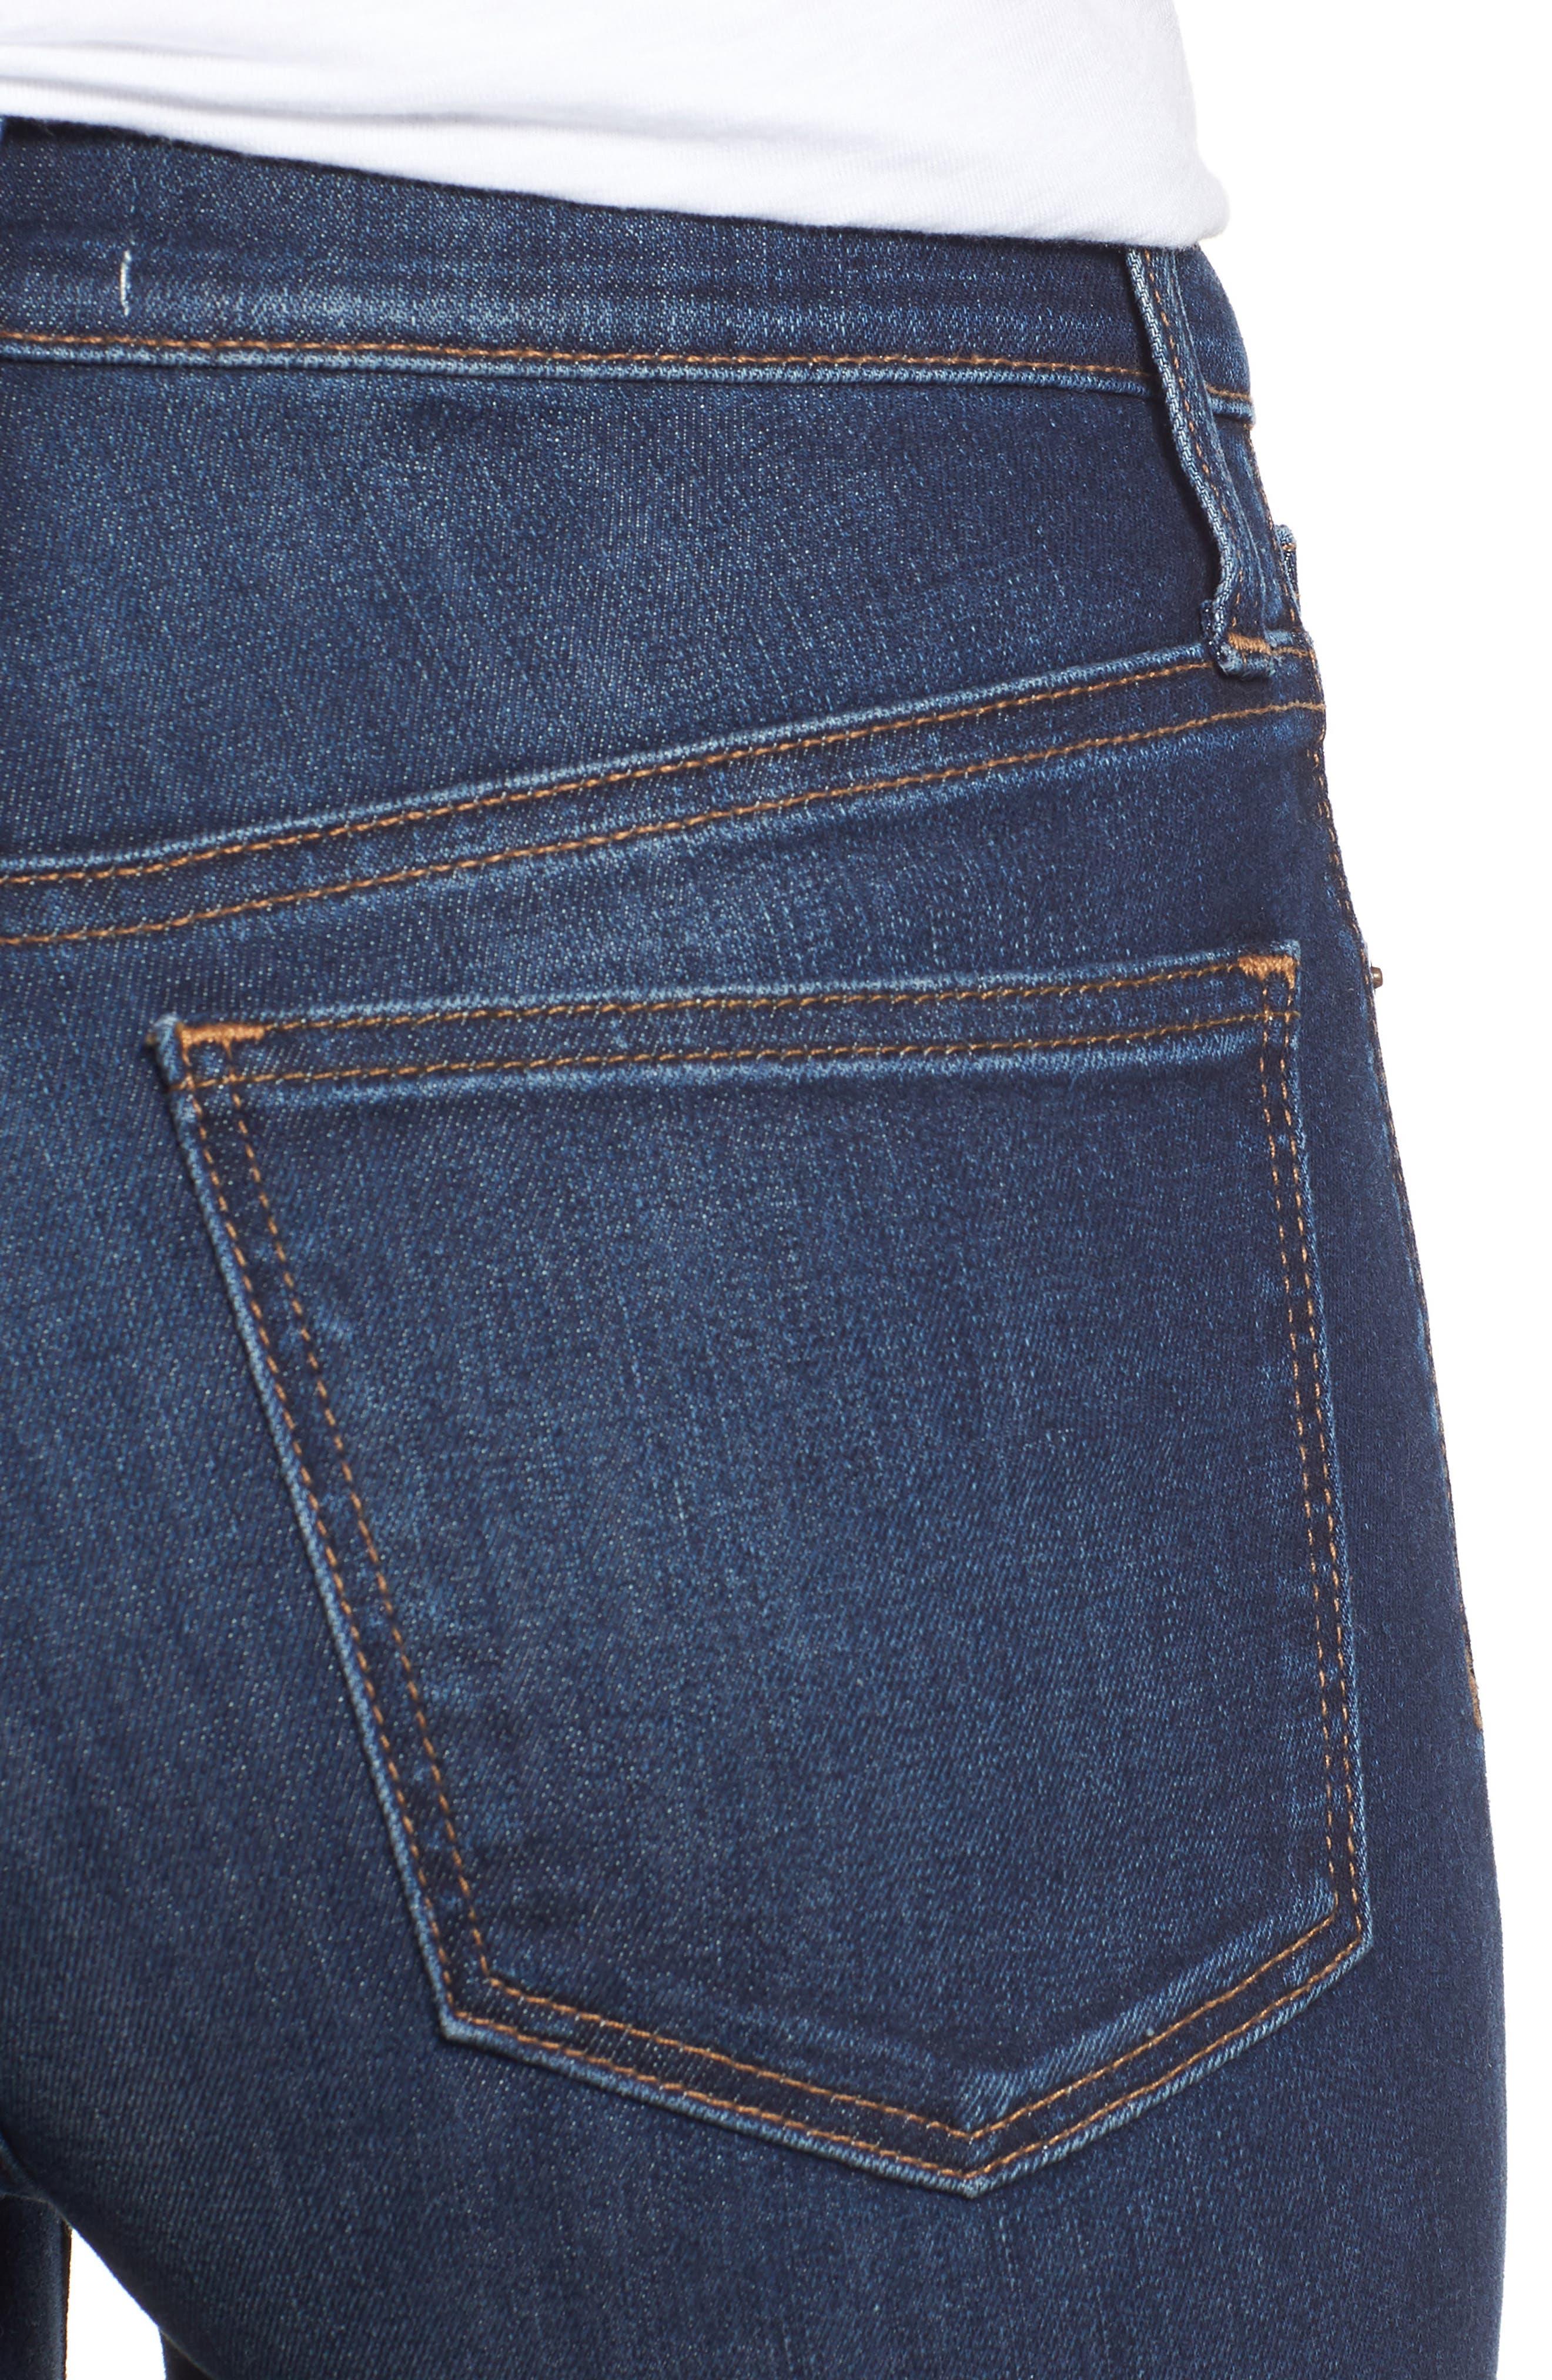 Skinny Jeans,                             Alternate thumbnail 4, color,                             DARK SOFT